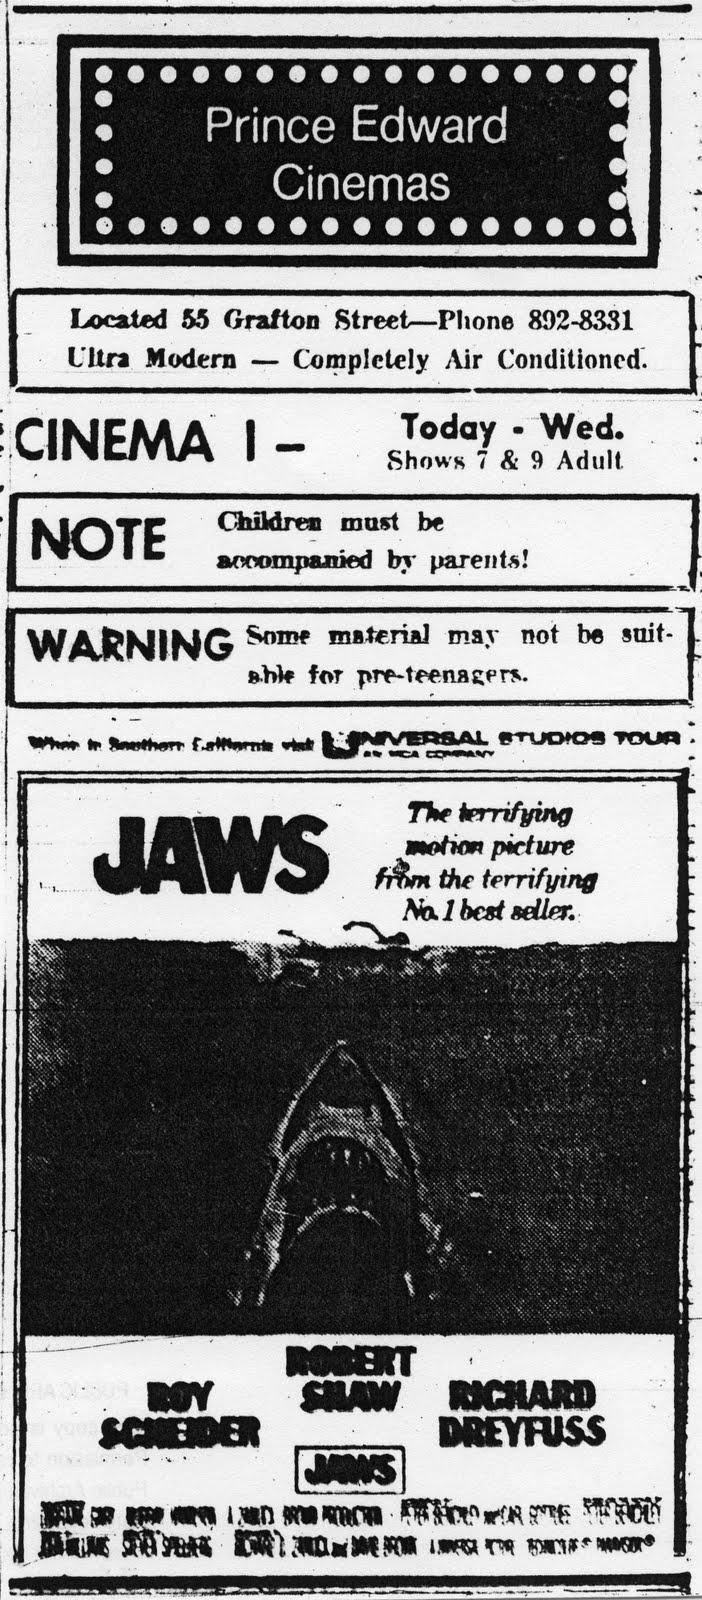 Bloody Terror 1970 S Newspaper Movie Ads